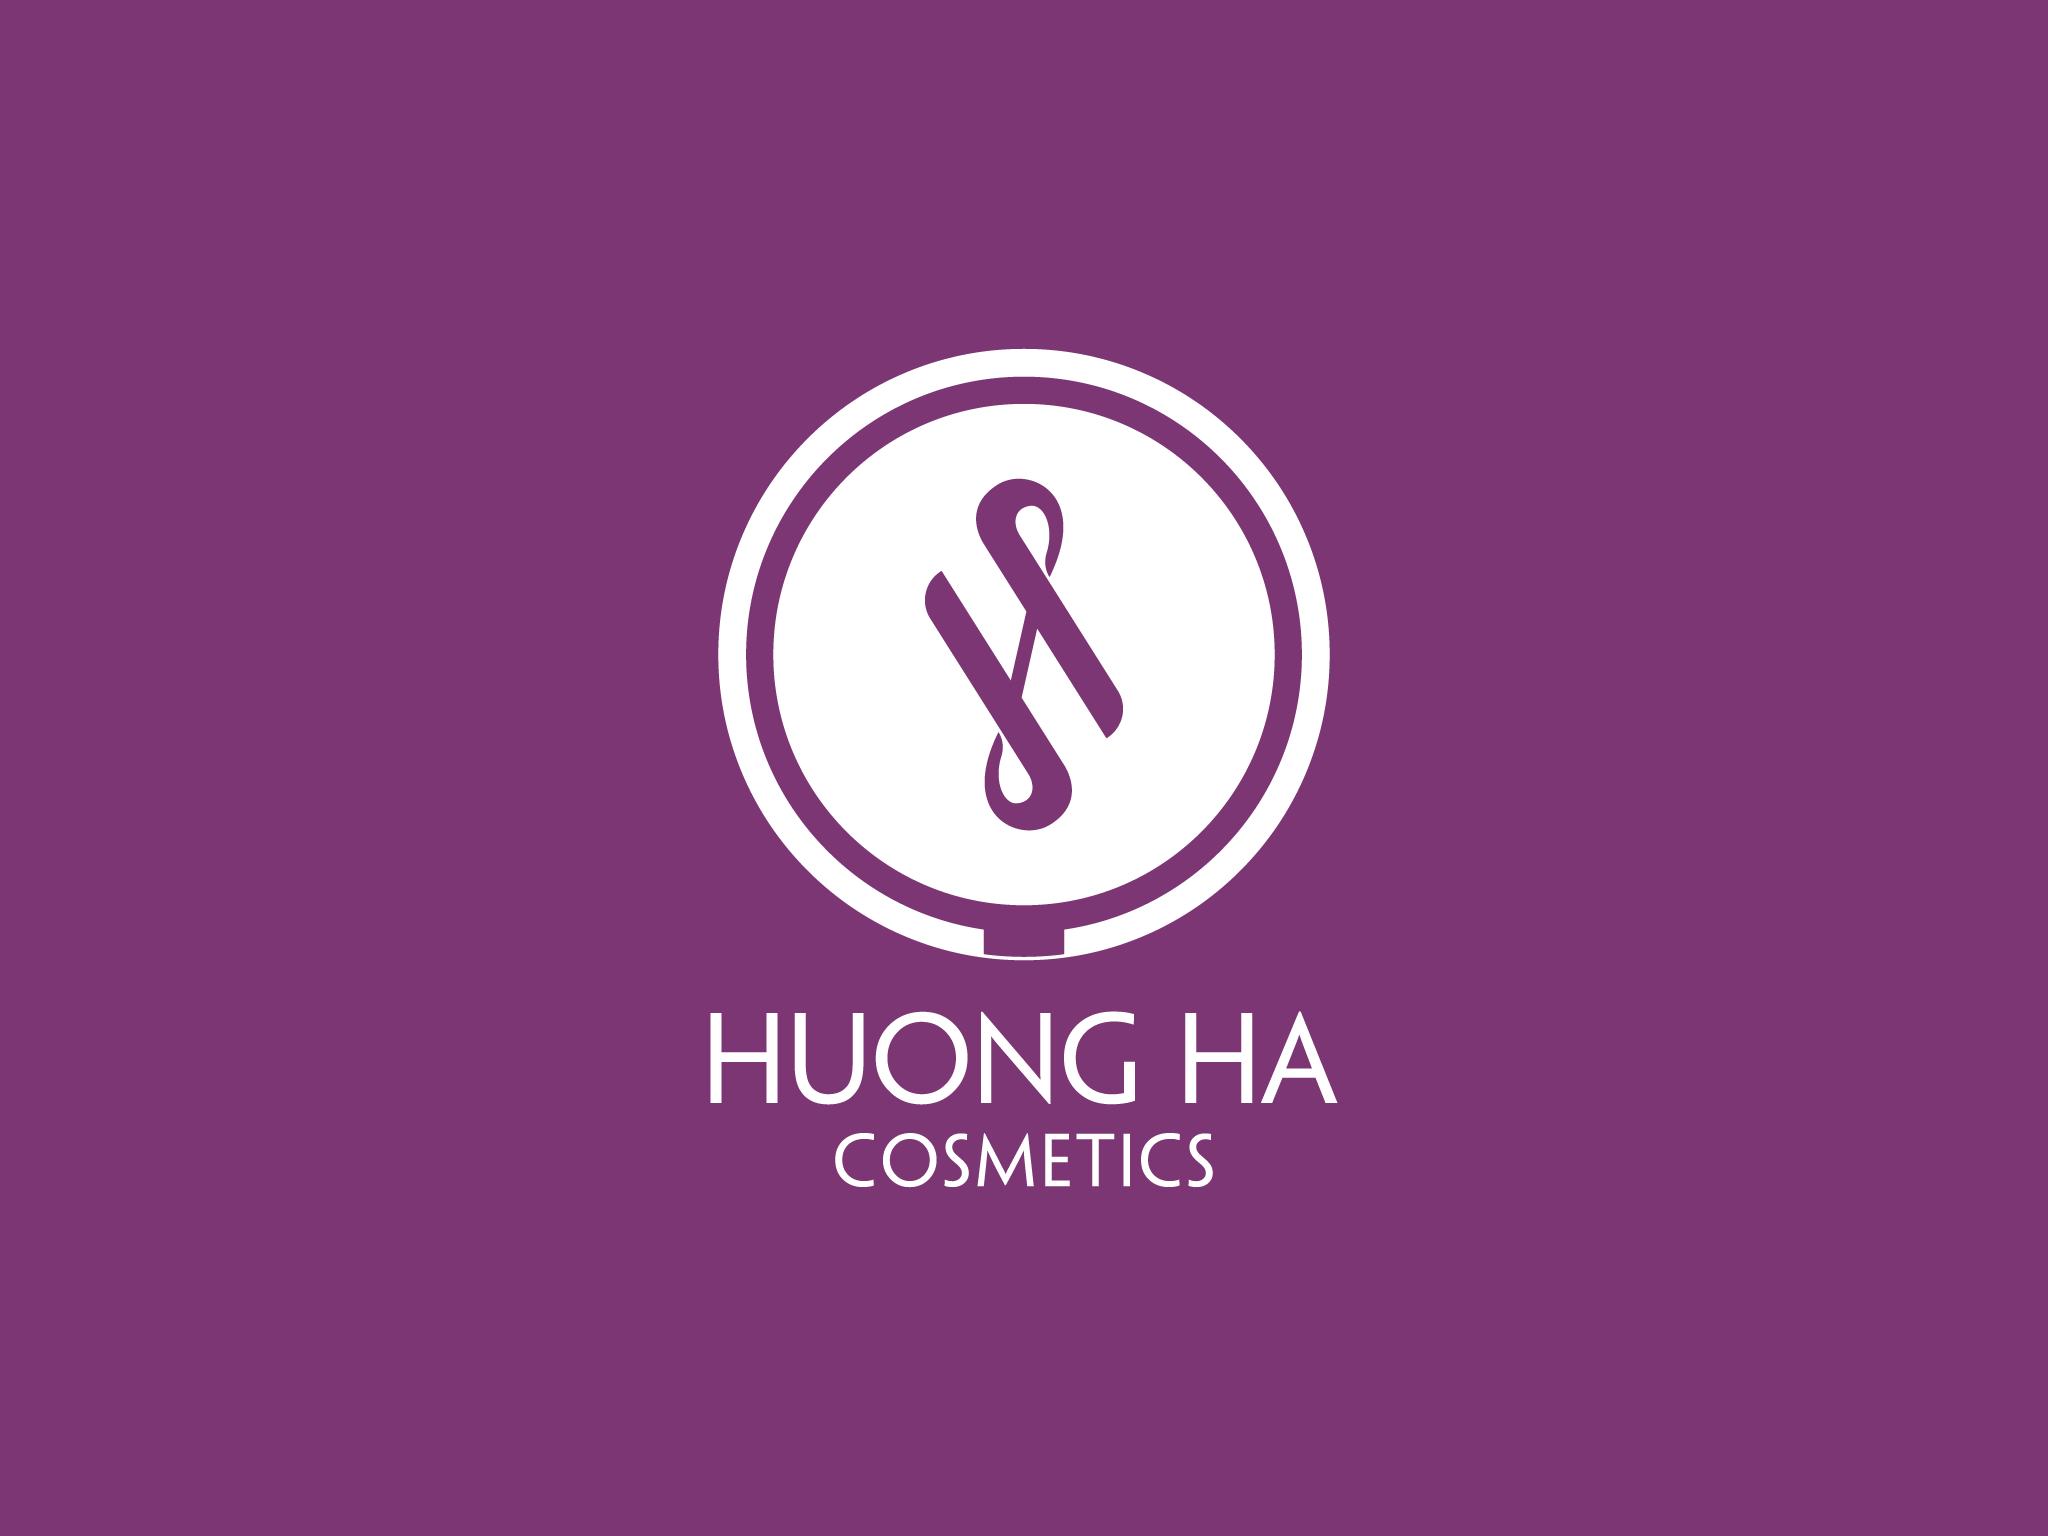 Logo Huong Ha Cosmetics